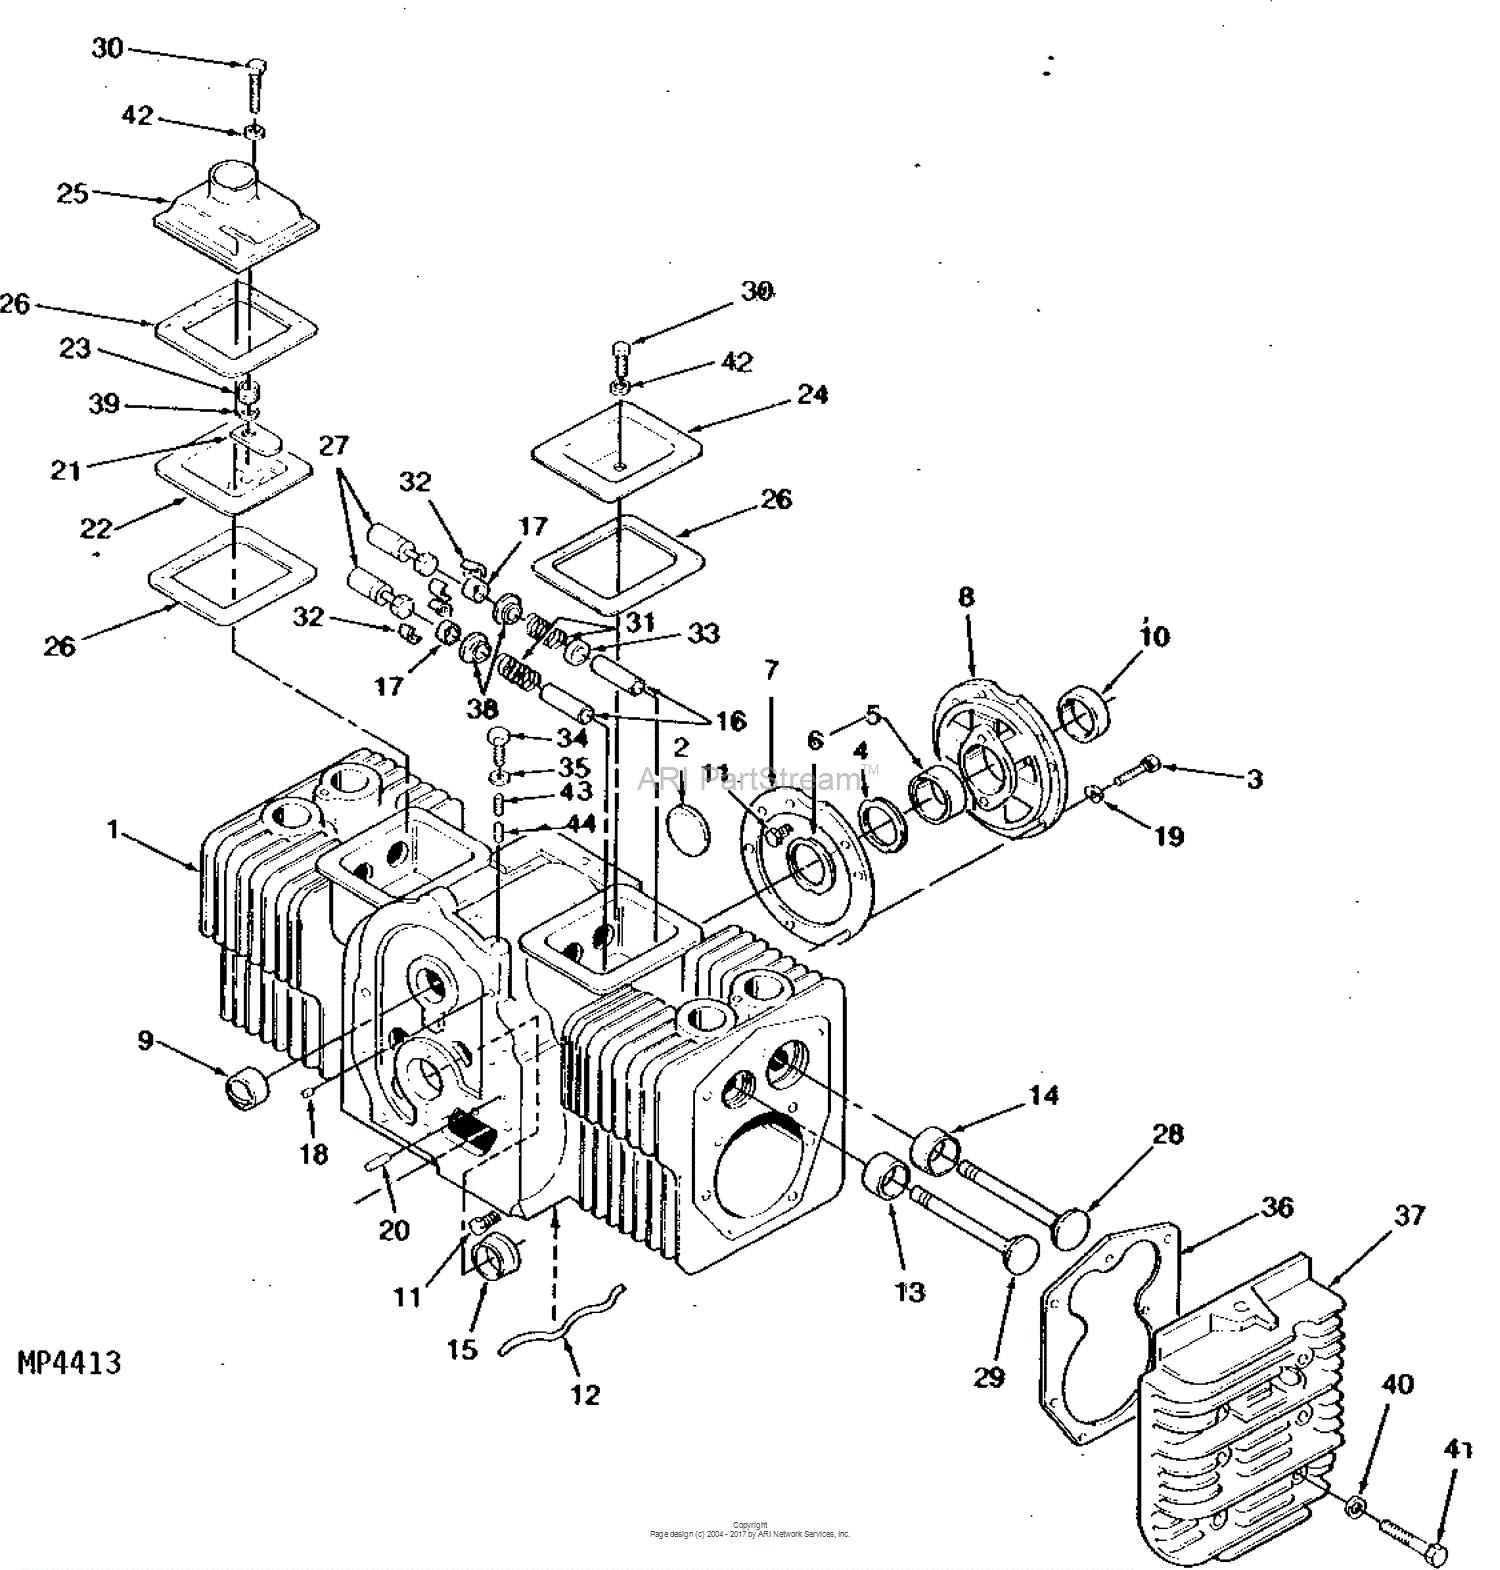 Onan engine parts diagram john deere parts diagrams john deere 317 hydrostatic tractor 17 hp of